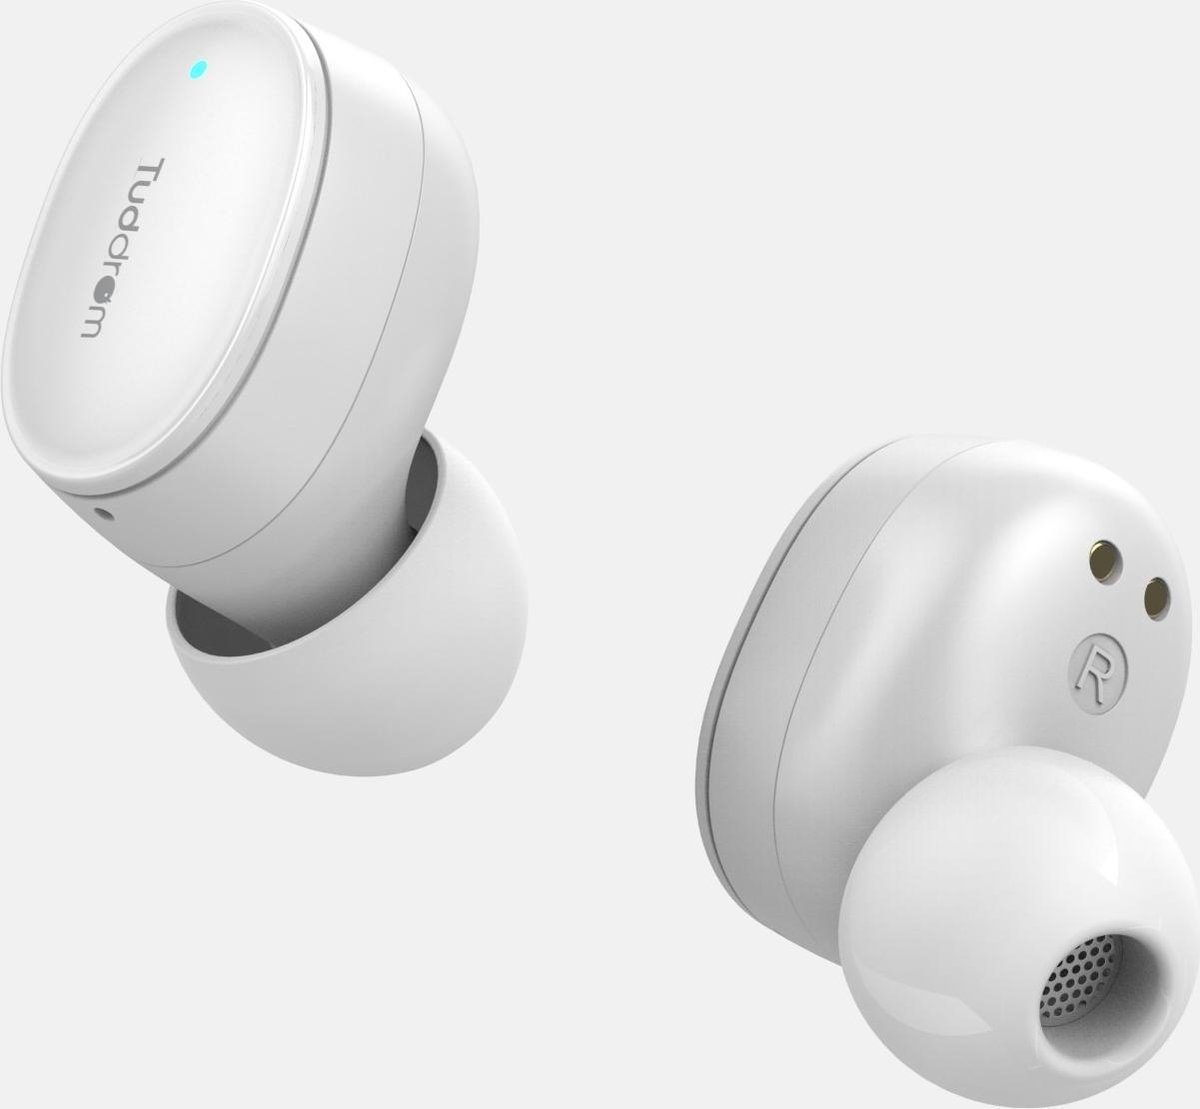 Tuddrom T200 Wit – Wireless Earbuds Oordopjes met Powerbank Opbergdoos – Polymer Composite Diaphragm Drivers – Bluetooth 5.0 – IPX5 Waterdicht – 2 Jaar Garantie